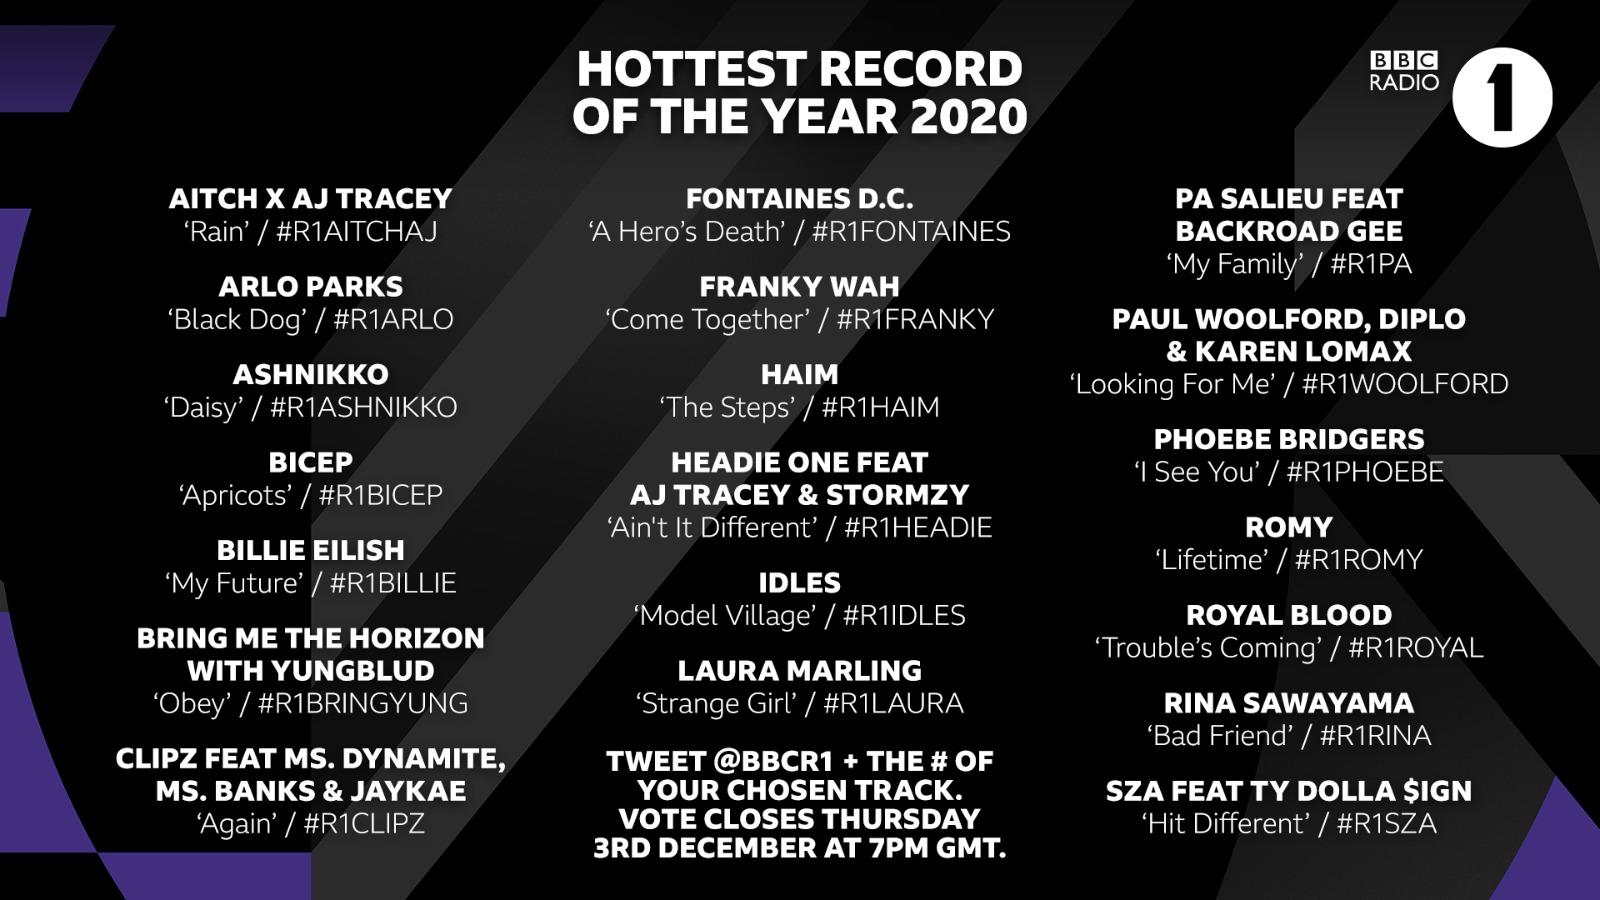 BBC Radio 1 Annie Mac Hottest Record of the Year 2020